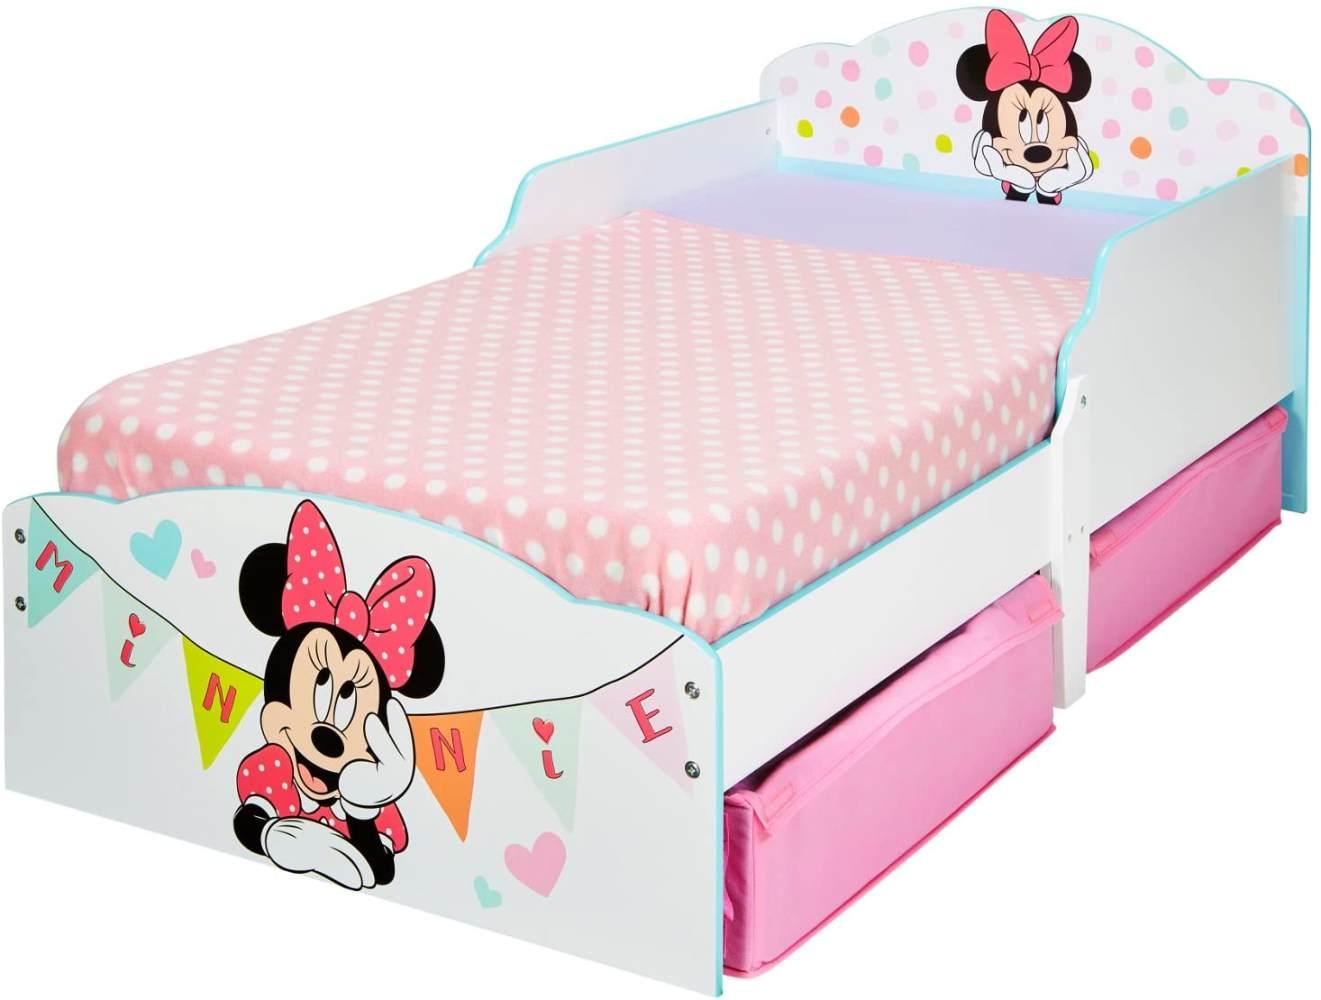 Worlds Apart 'Minnie Mouse' Kinderbett weiß 70 x 140 cm Bild 1